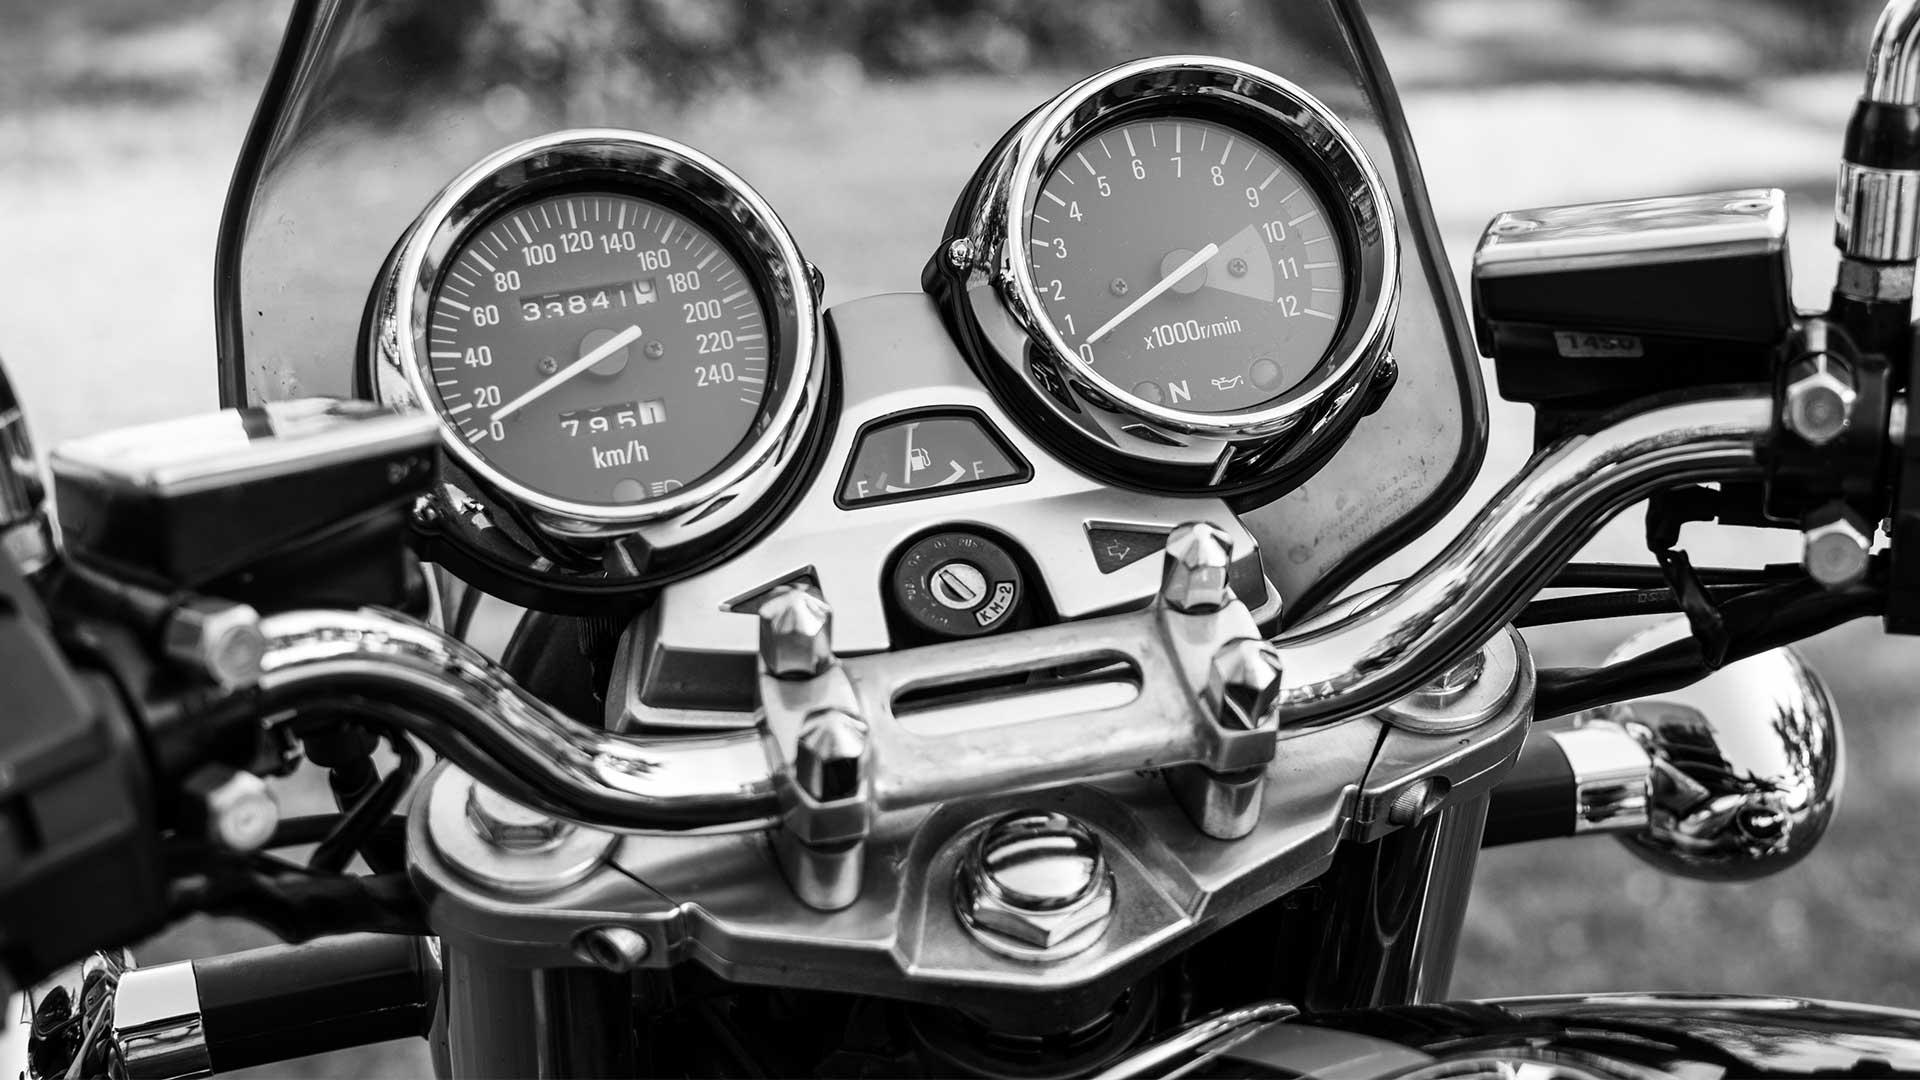 Moto Kawasaki Zephyr 1100